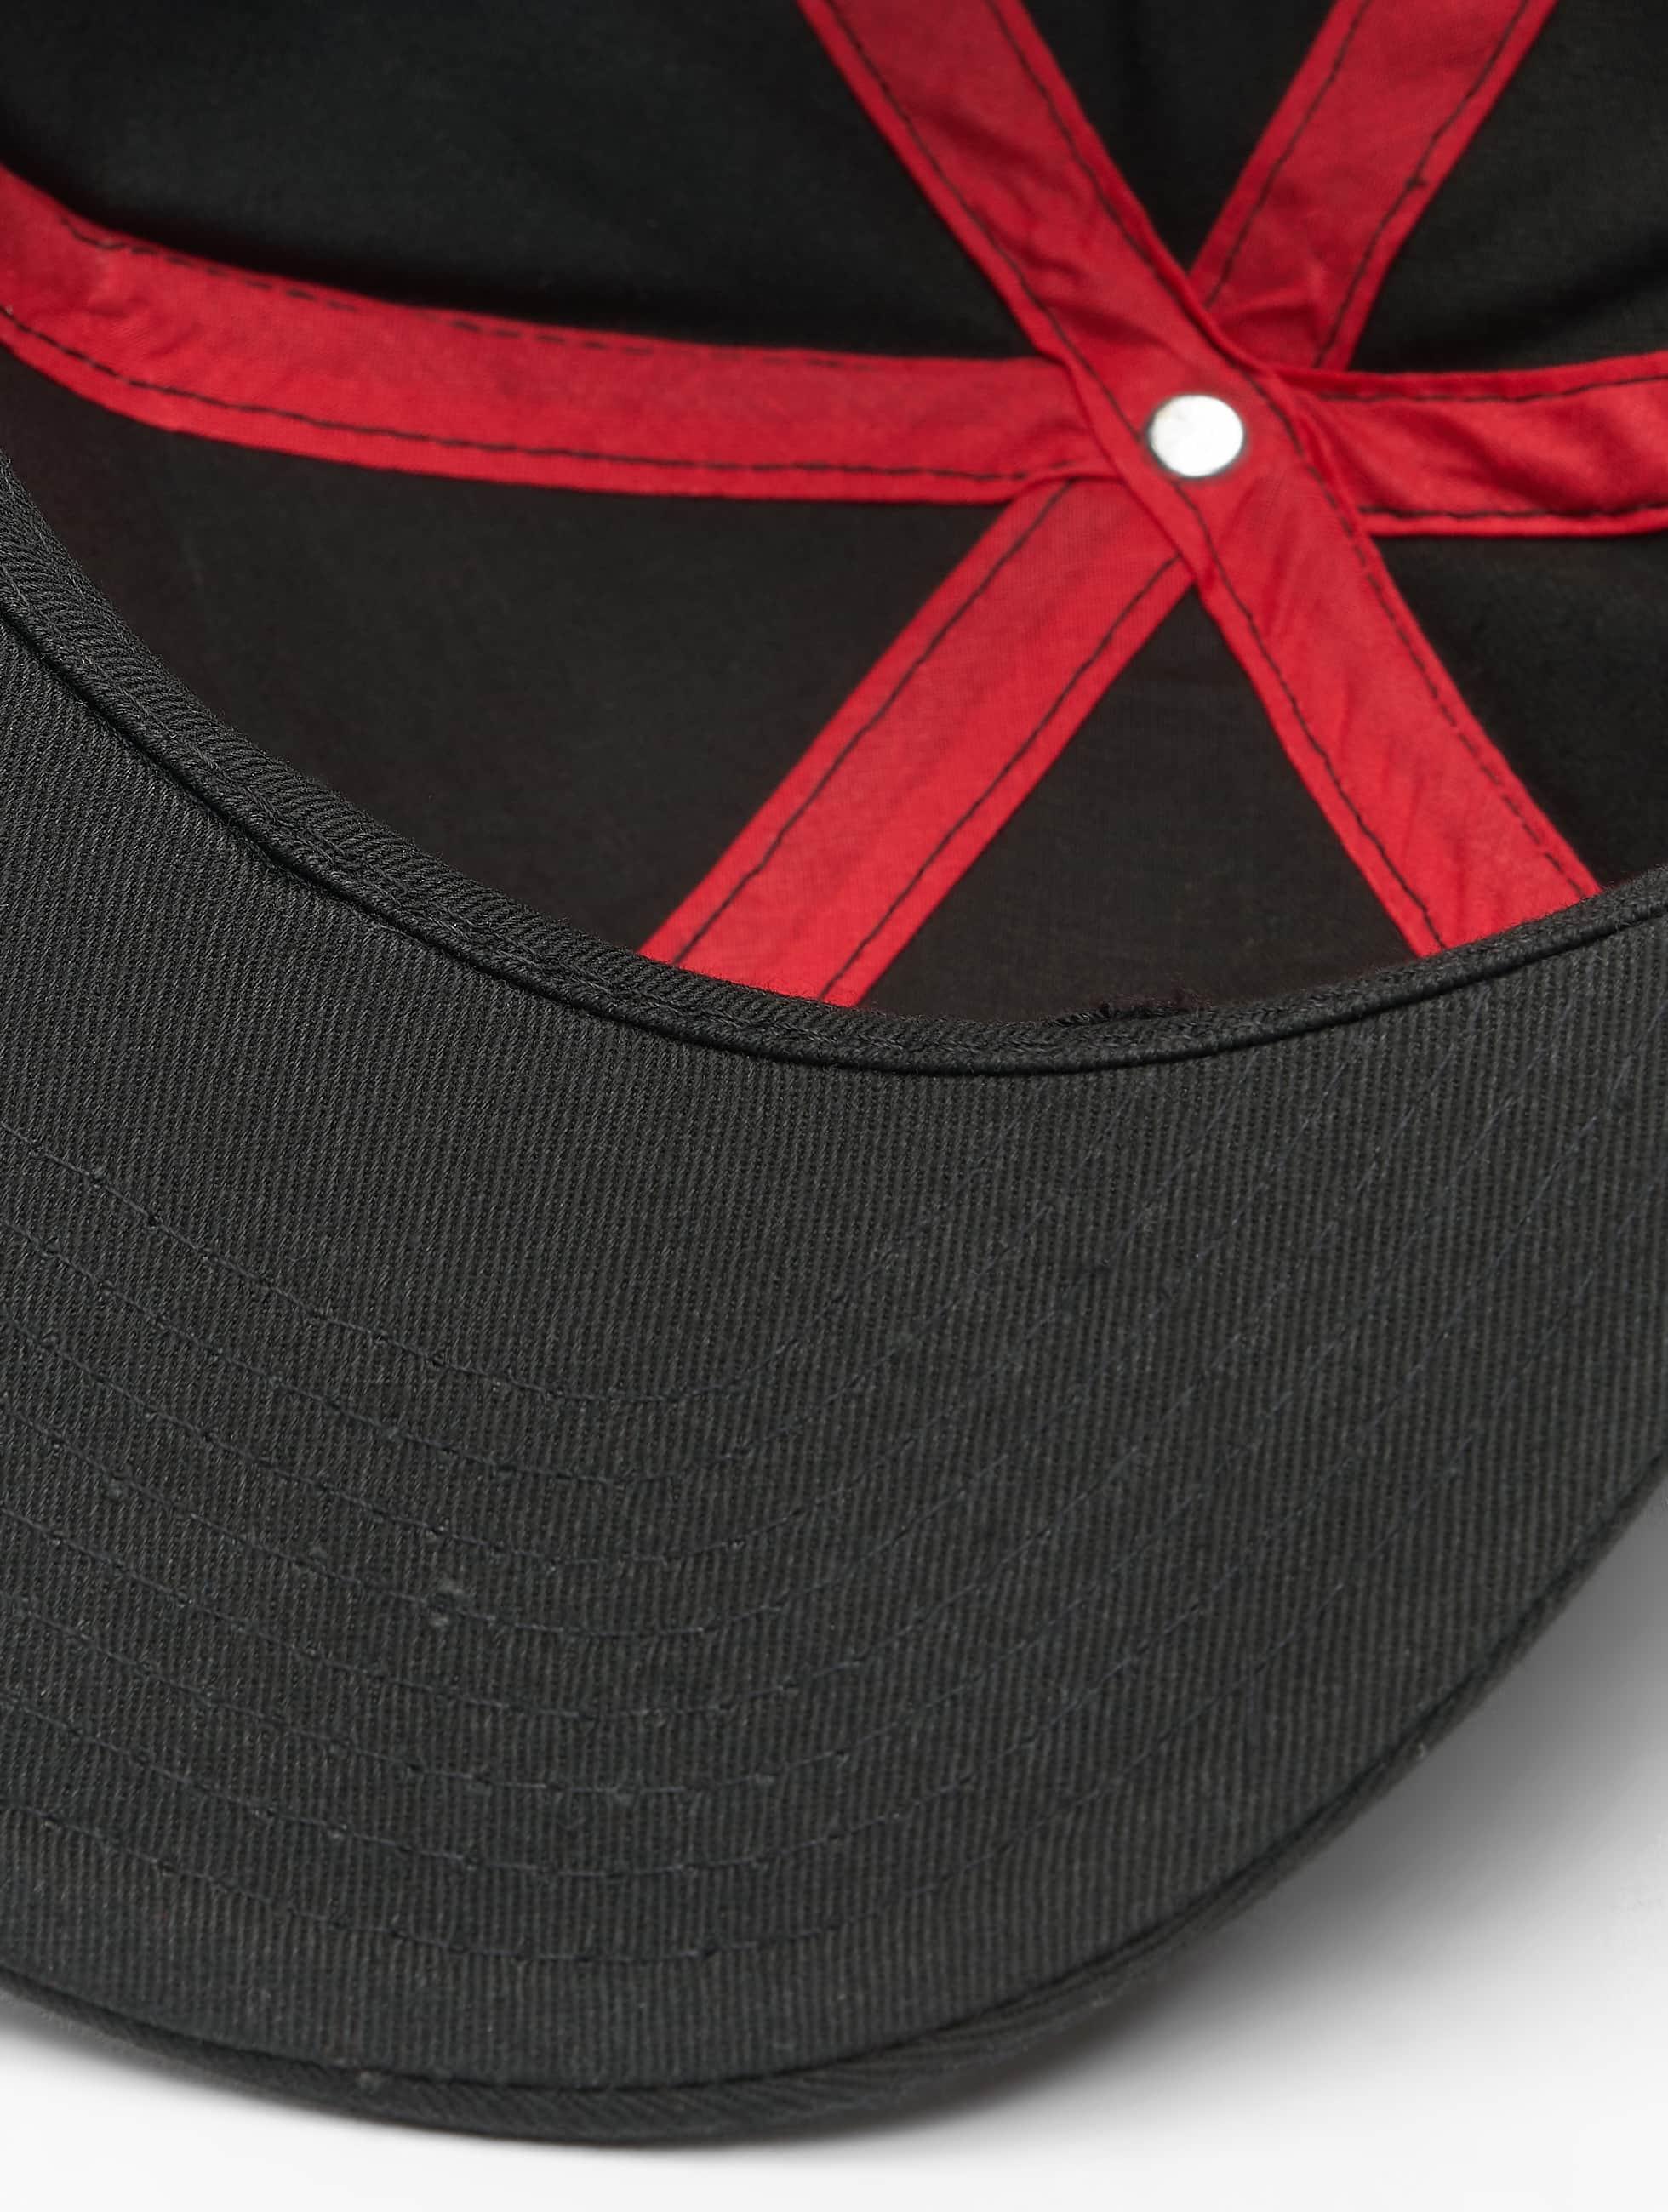 MSTRDS Casquette Snapback & Strapback X Letter noir